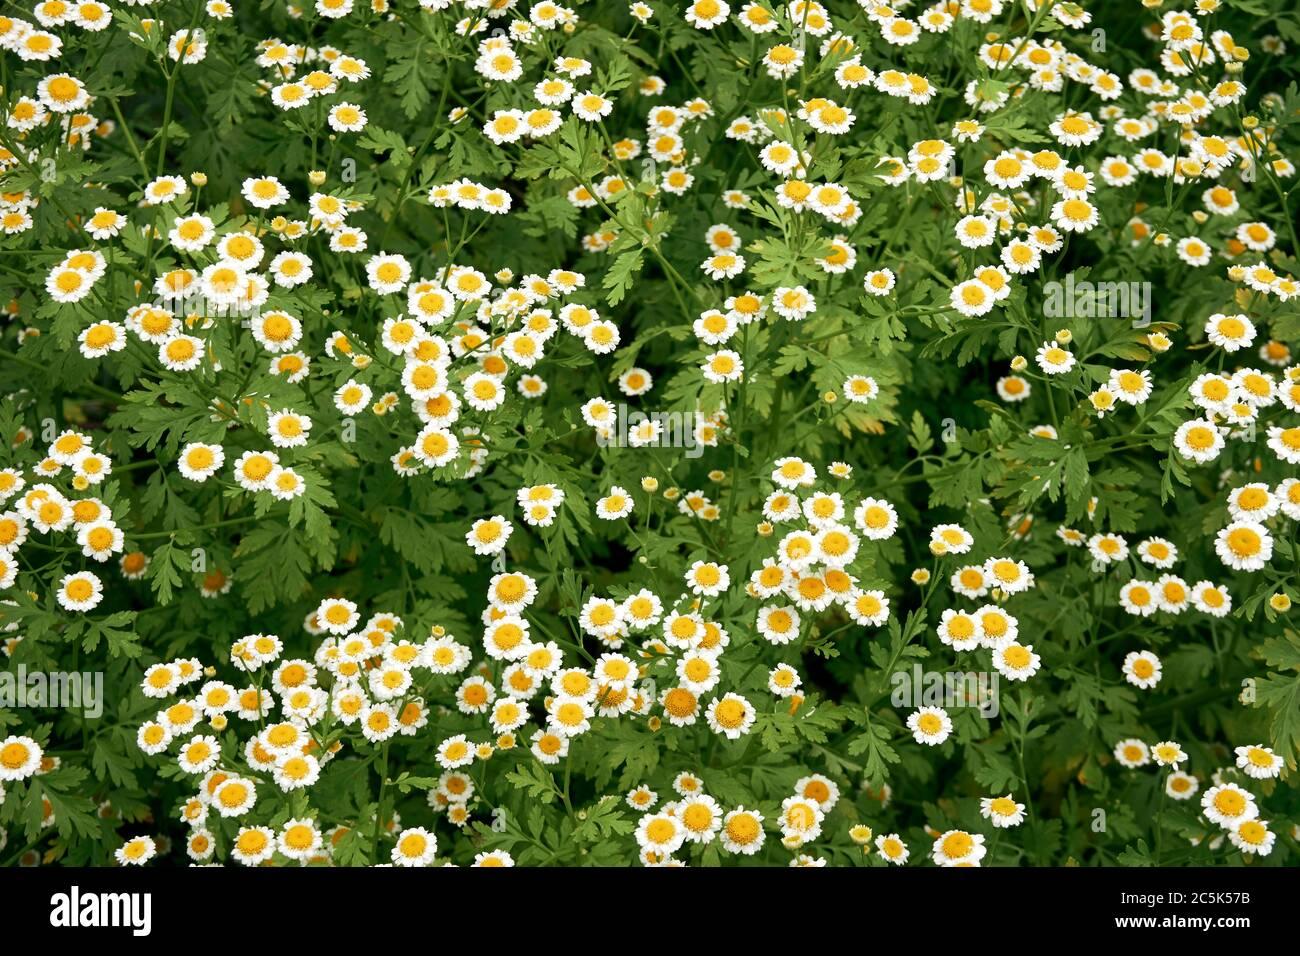 miniature-daisies-2C5K57B.jpg